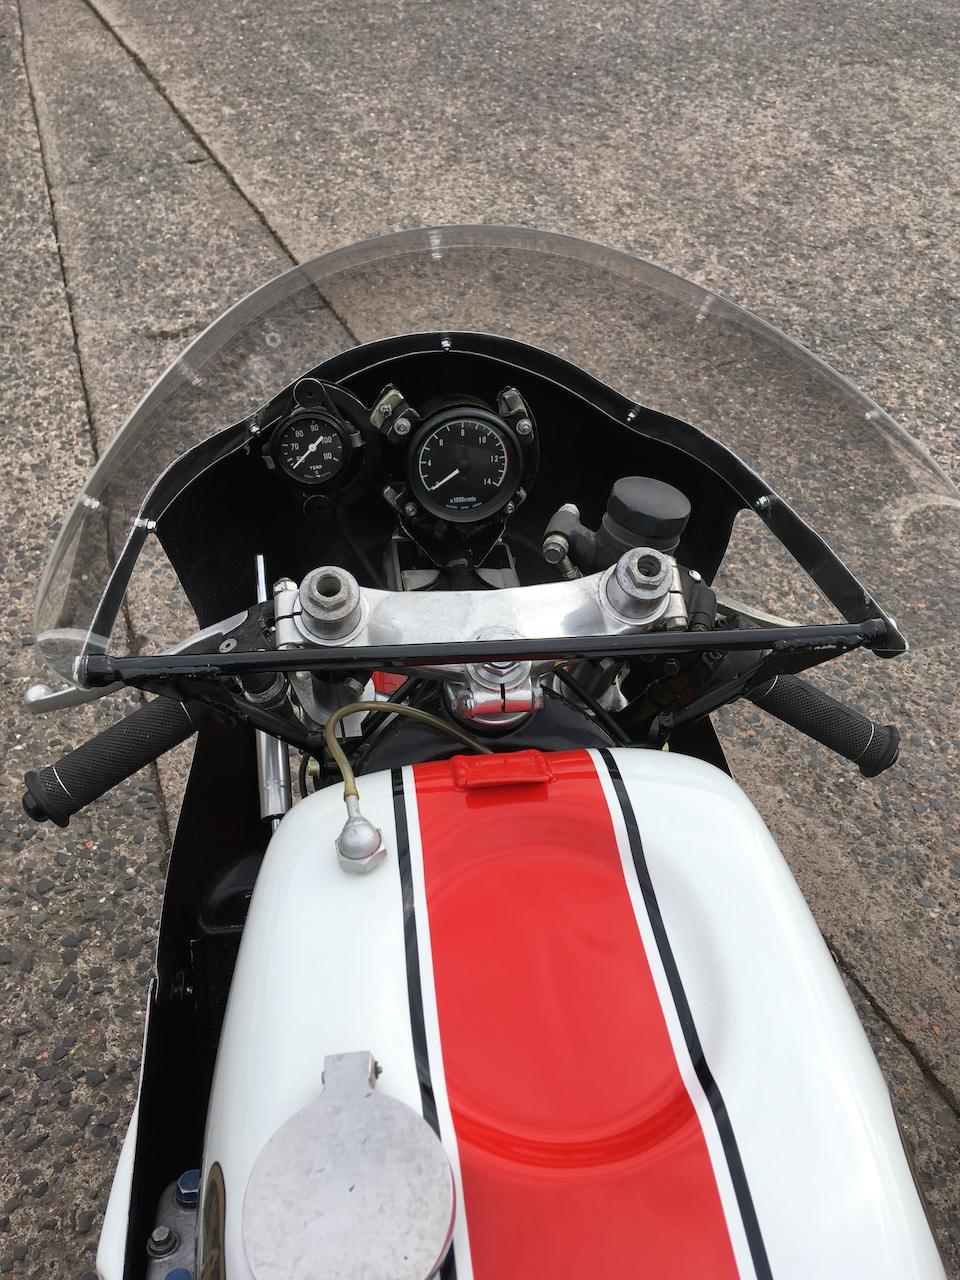 c.1979 Yamaha TZ750F Racing Motorcycle Frame no. 409-200415 Engine no. 409-200415